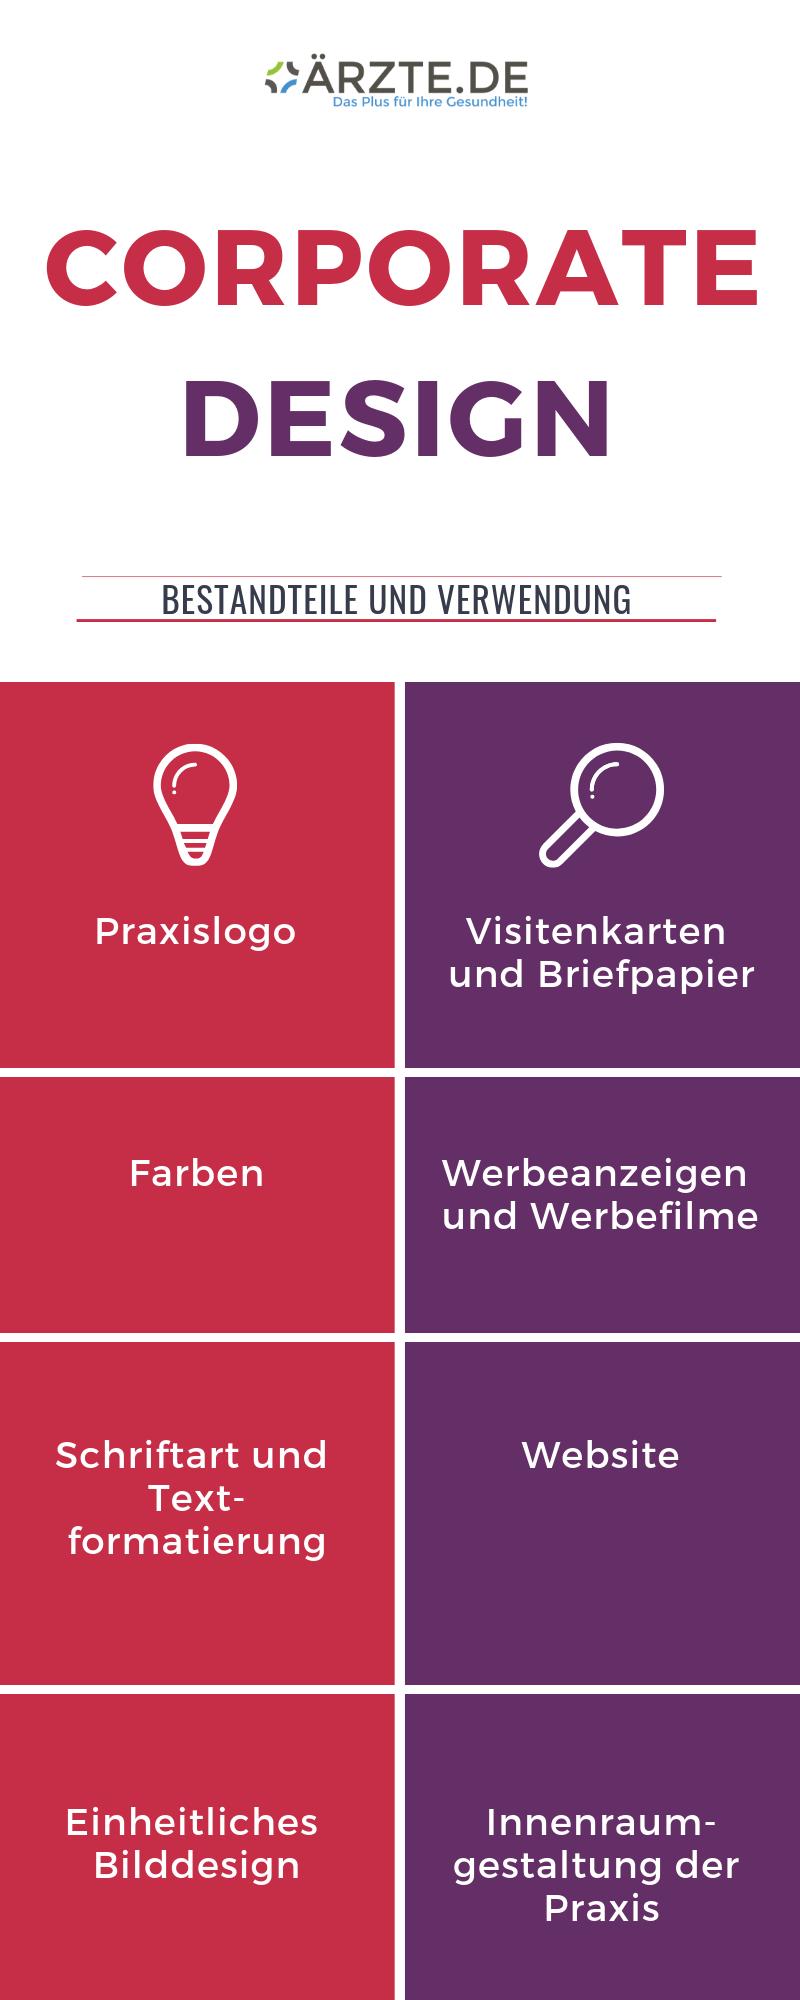 Corporate_Design_Infografik_aerztede